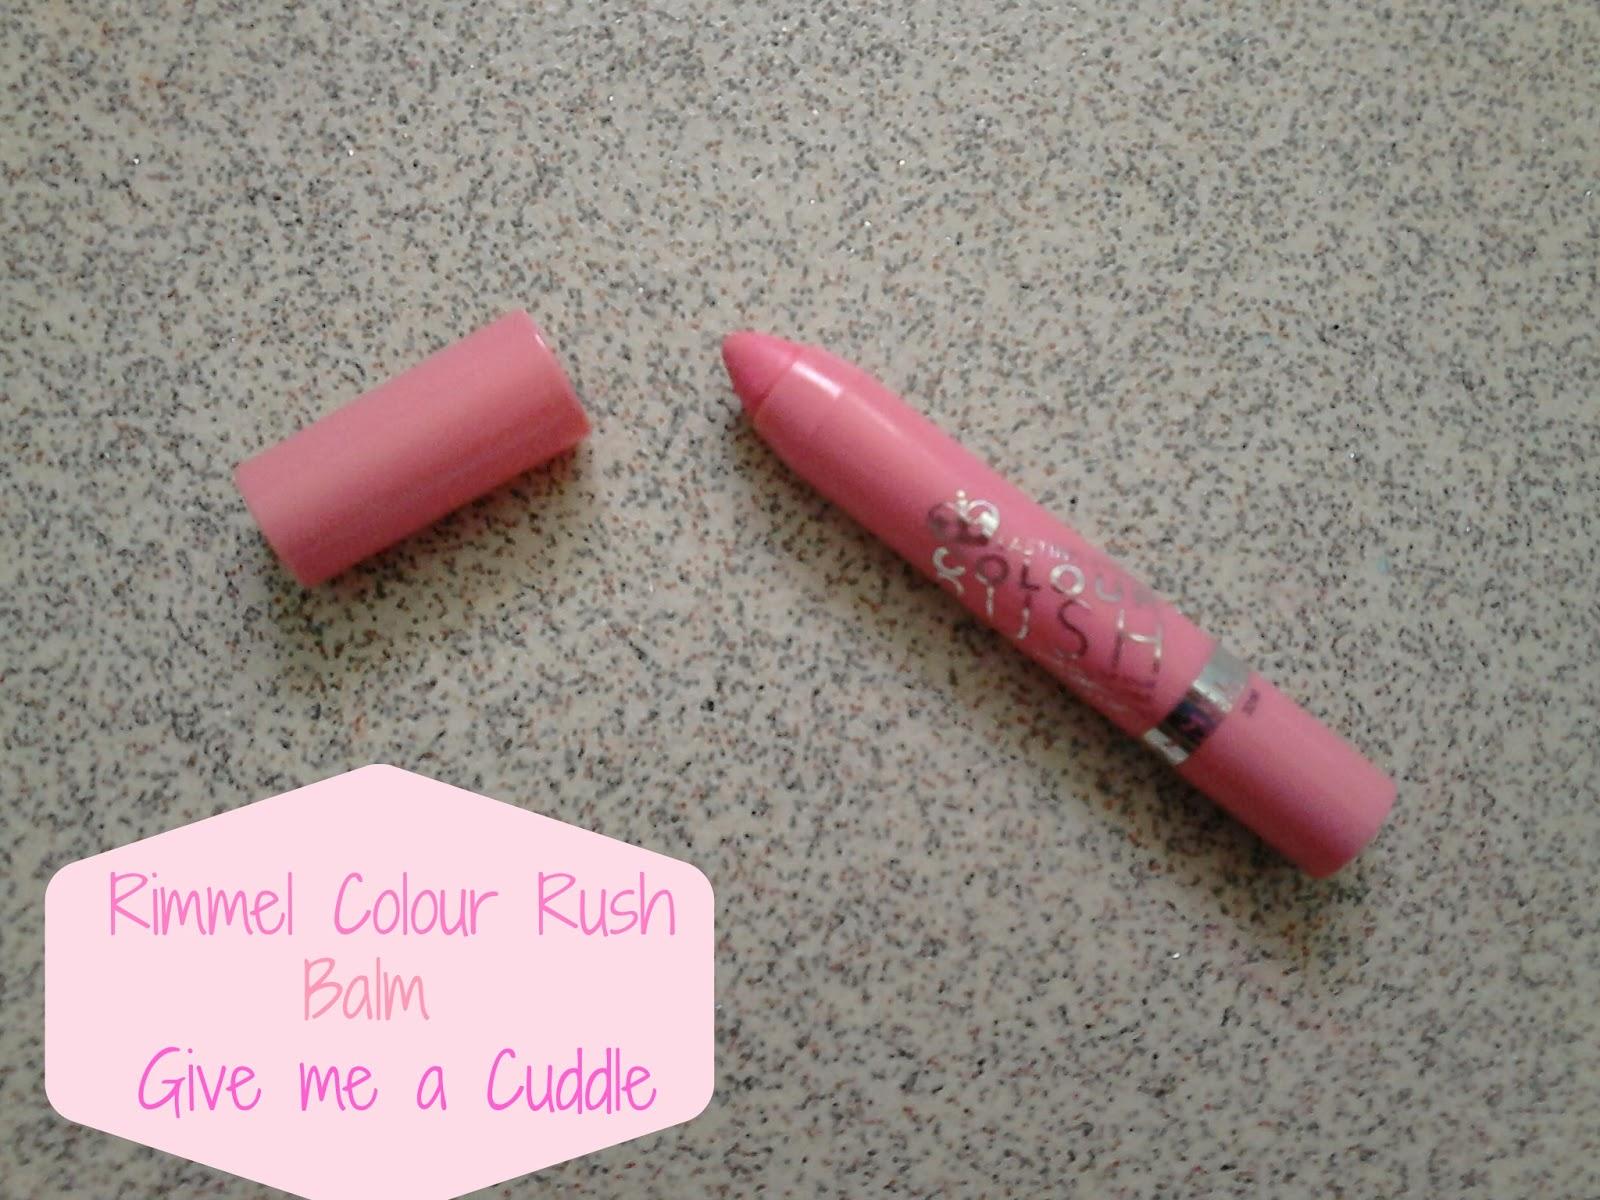 Rimmel Colour Rush Balm Give Me A Cuddle